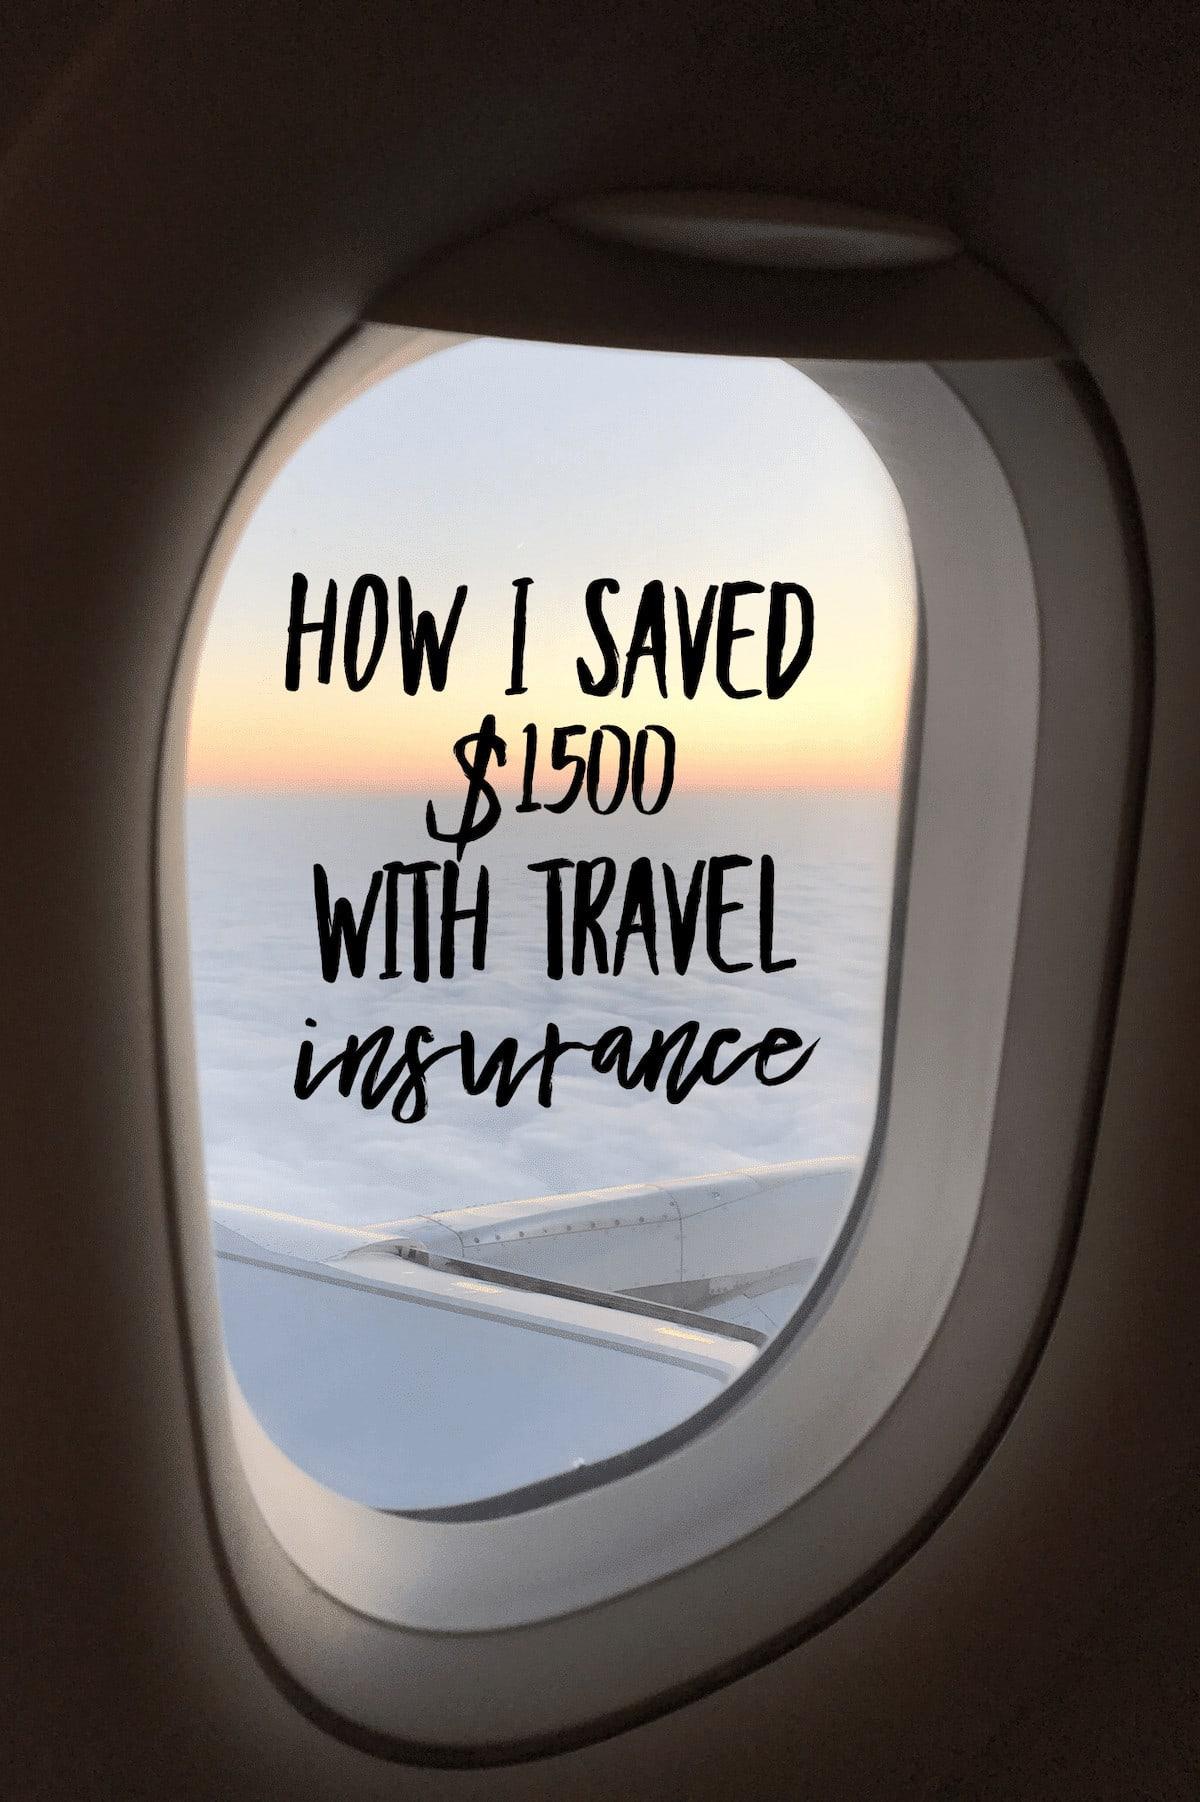 How I Saved ,500 With Travel Insurance - World Nomads Review | Best travel insurance | Why do I need travel insurance | How to buy travel insurance | Travel insurance review | How to save money with travel insurance |